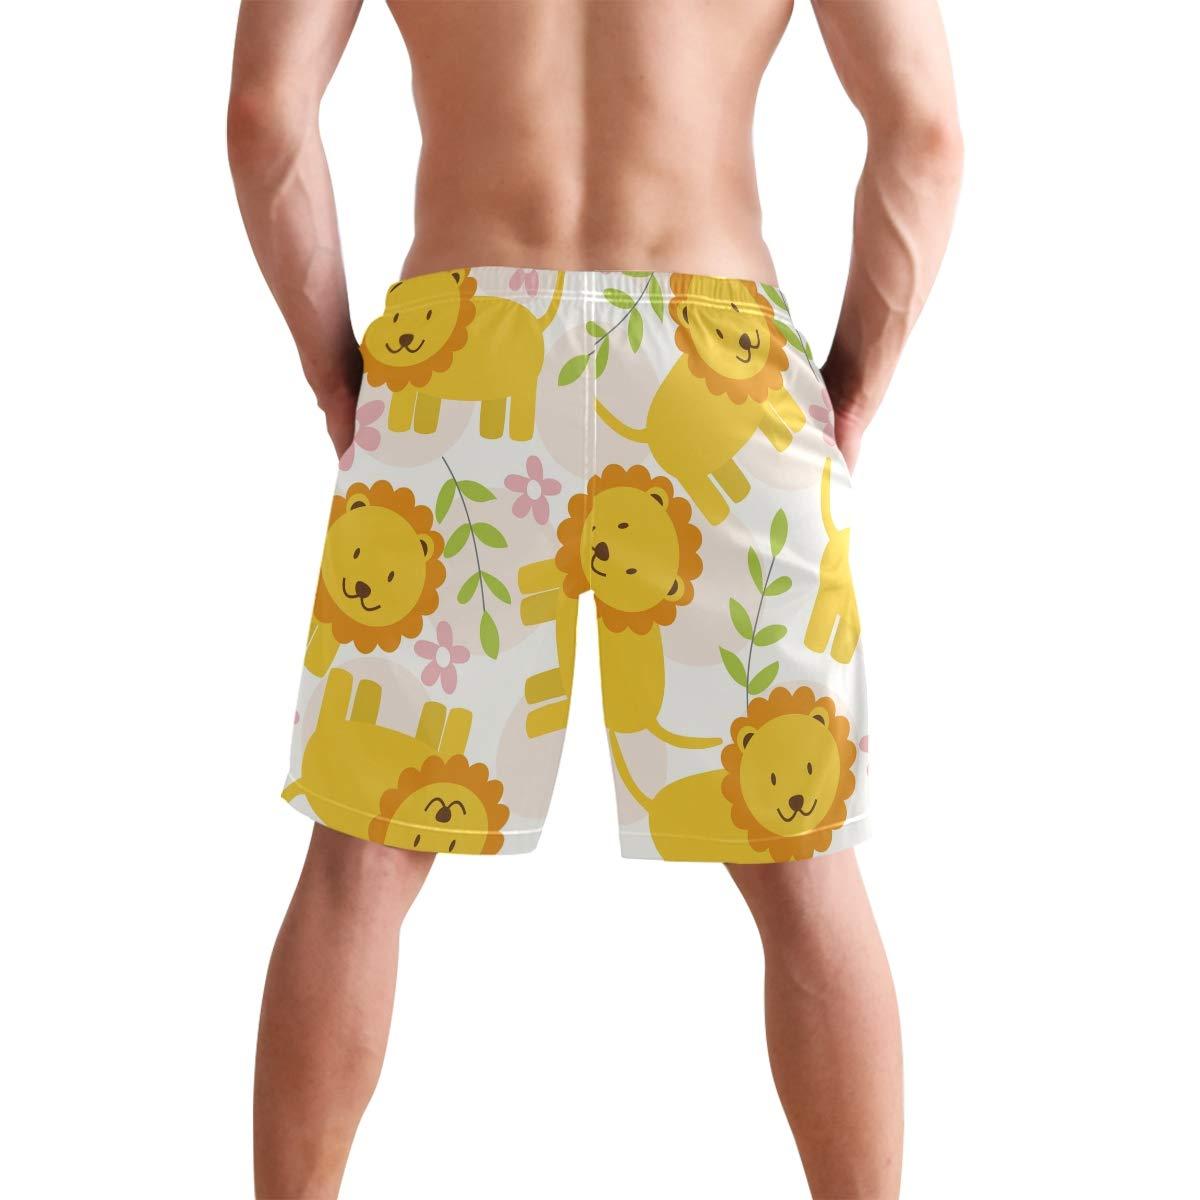 CiCily Men/'s Swim Trunks Pink Flower Yellow Lion Beach Board Shorts Swimming Short Pants Running Sports Surffing Shorts